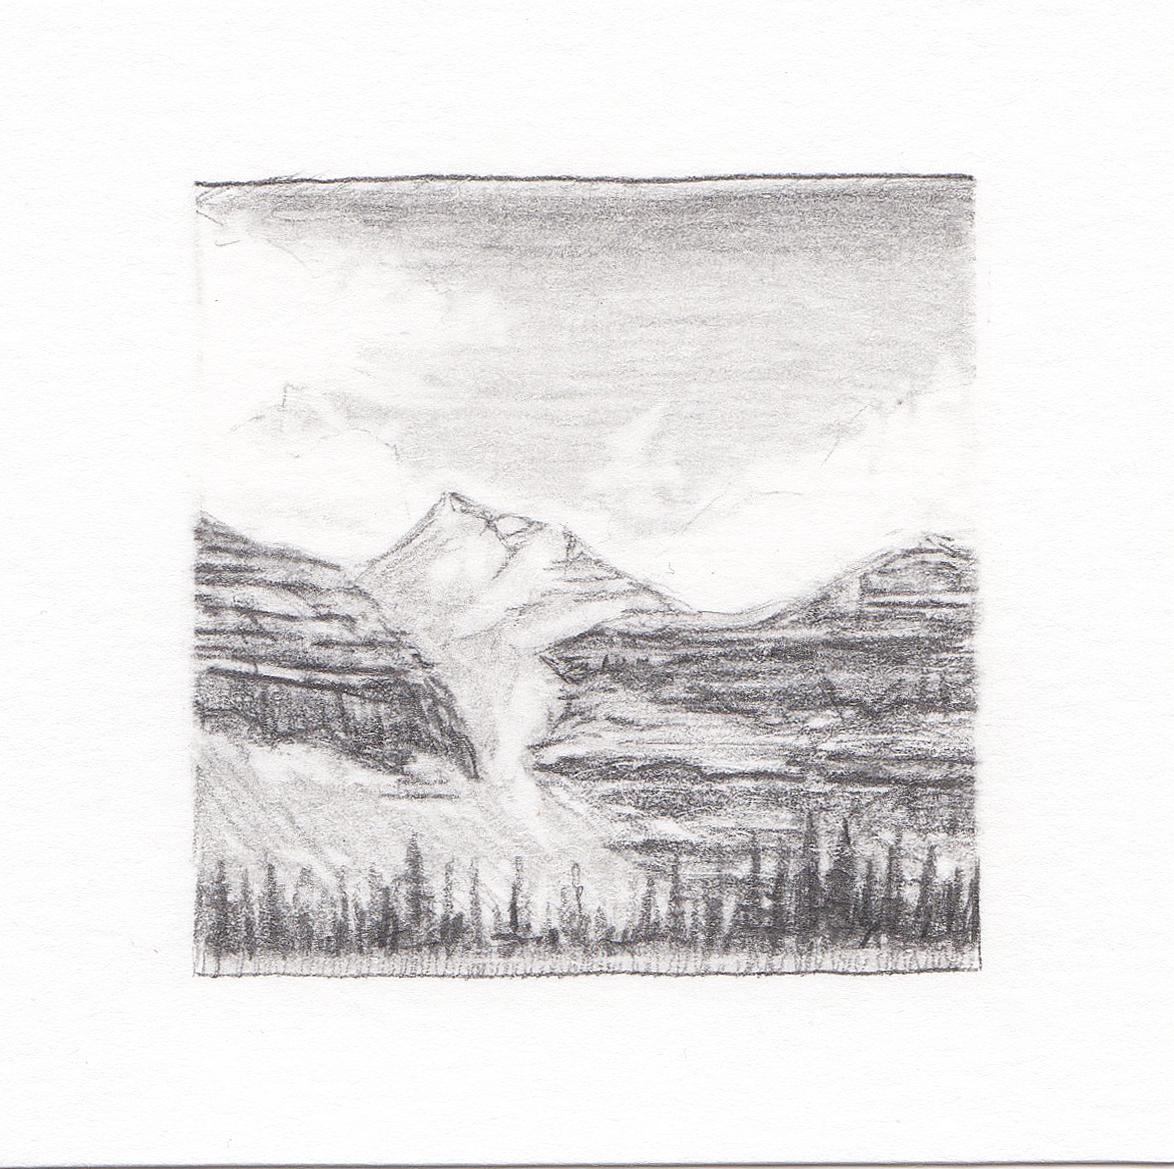 #46 Kings Peak, Uinta Mountains, Utah | 3x3 | graphite